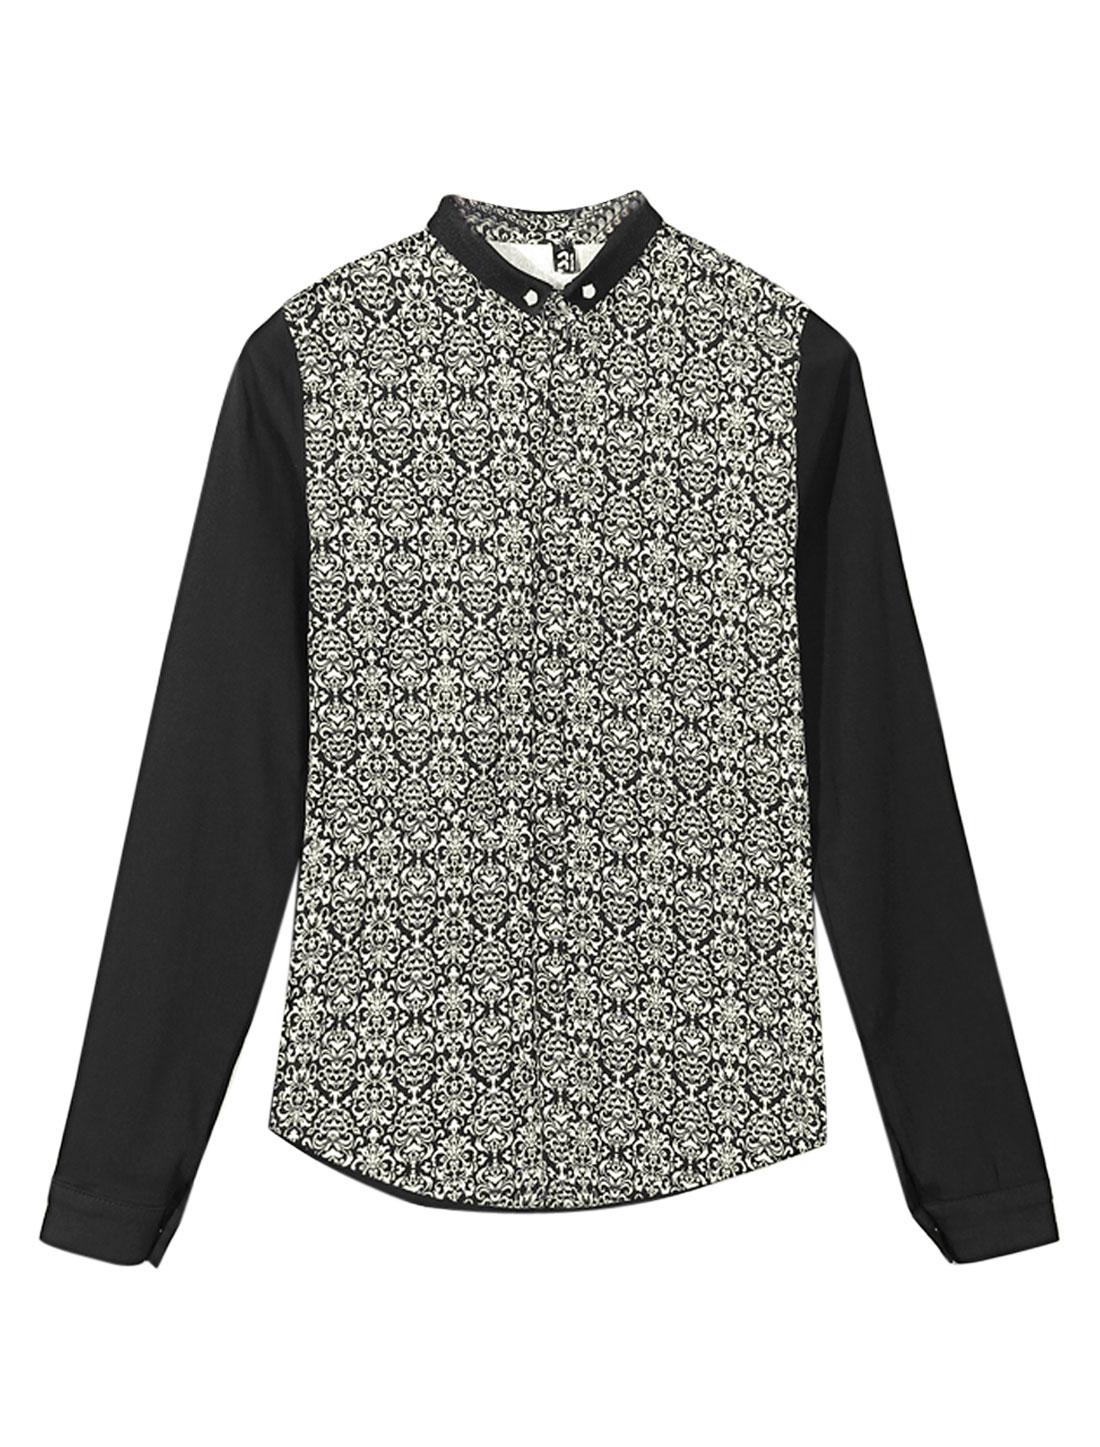 Men Contrast Novelty Print Panel Point Collar Slim Shirt Beige Black S